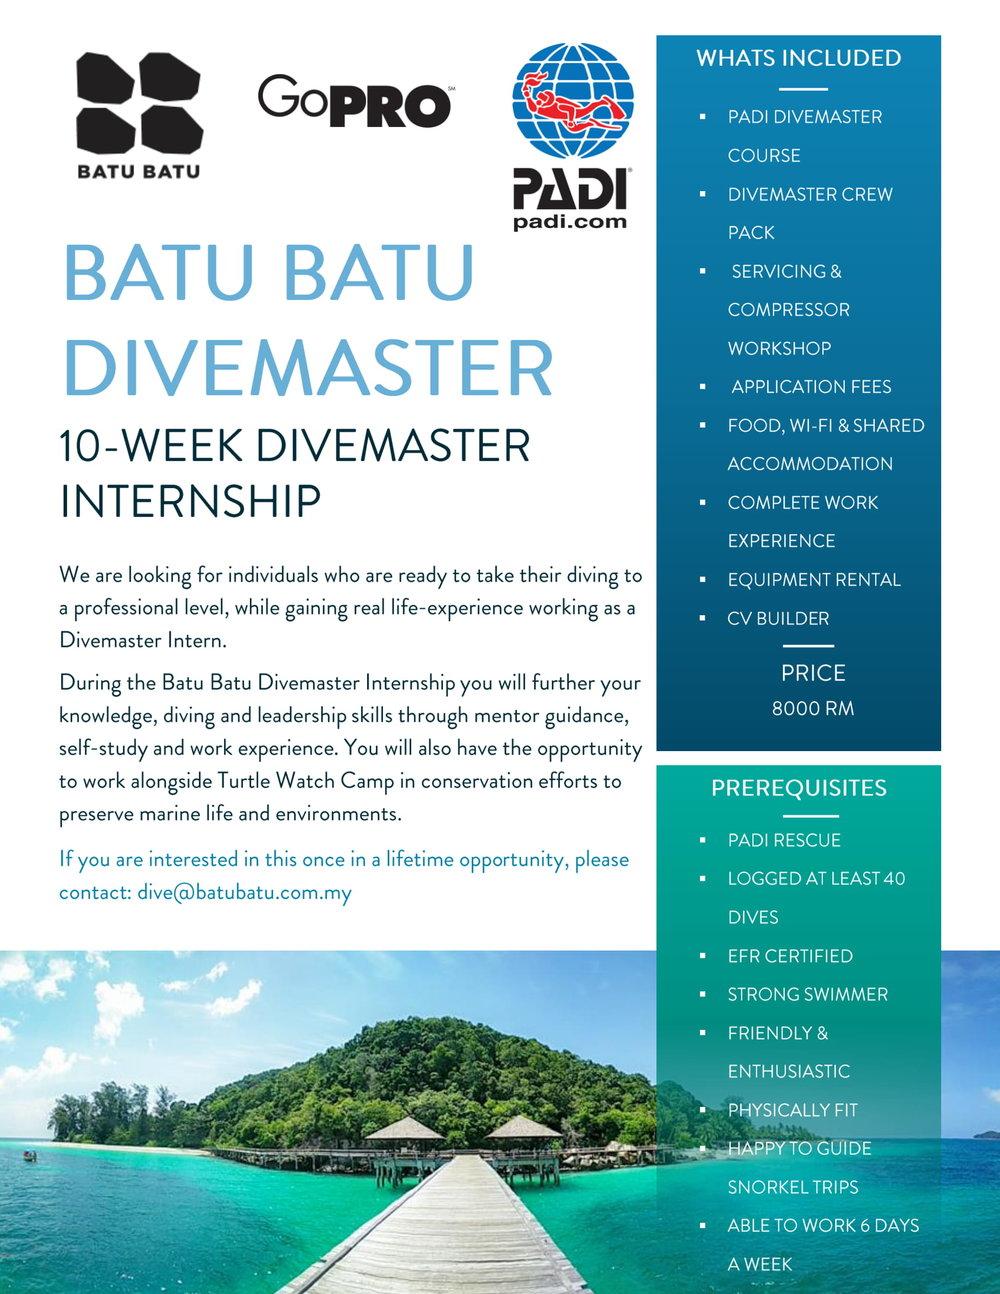 BATU BATU DIVEMASTER FLYER-1.jpg